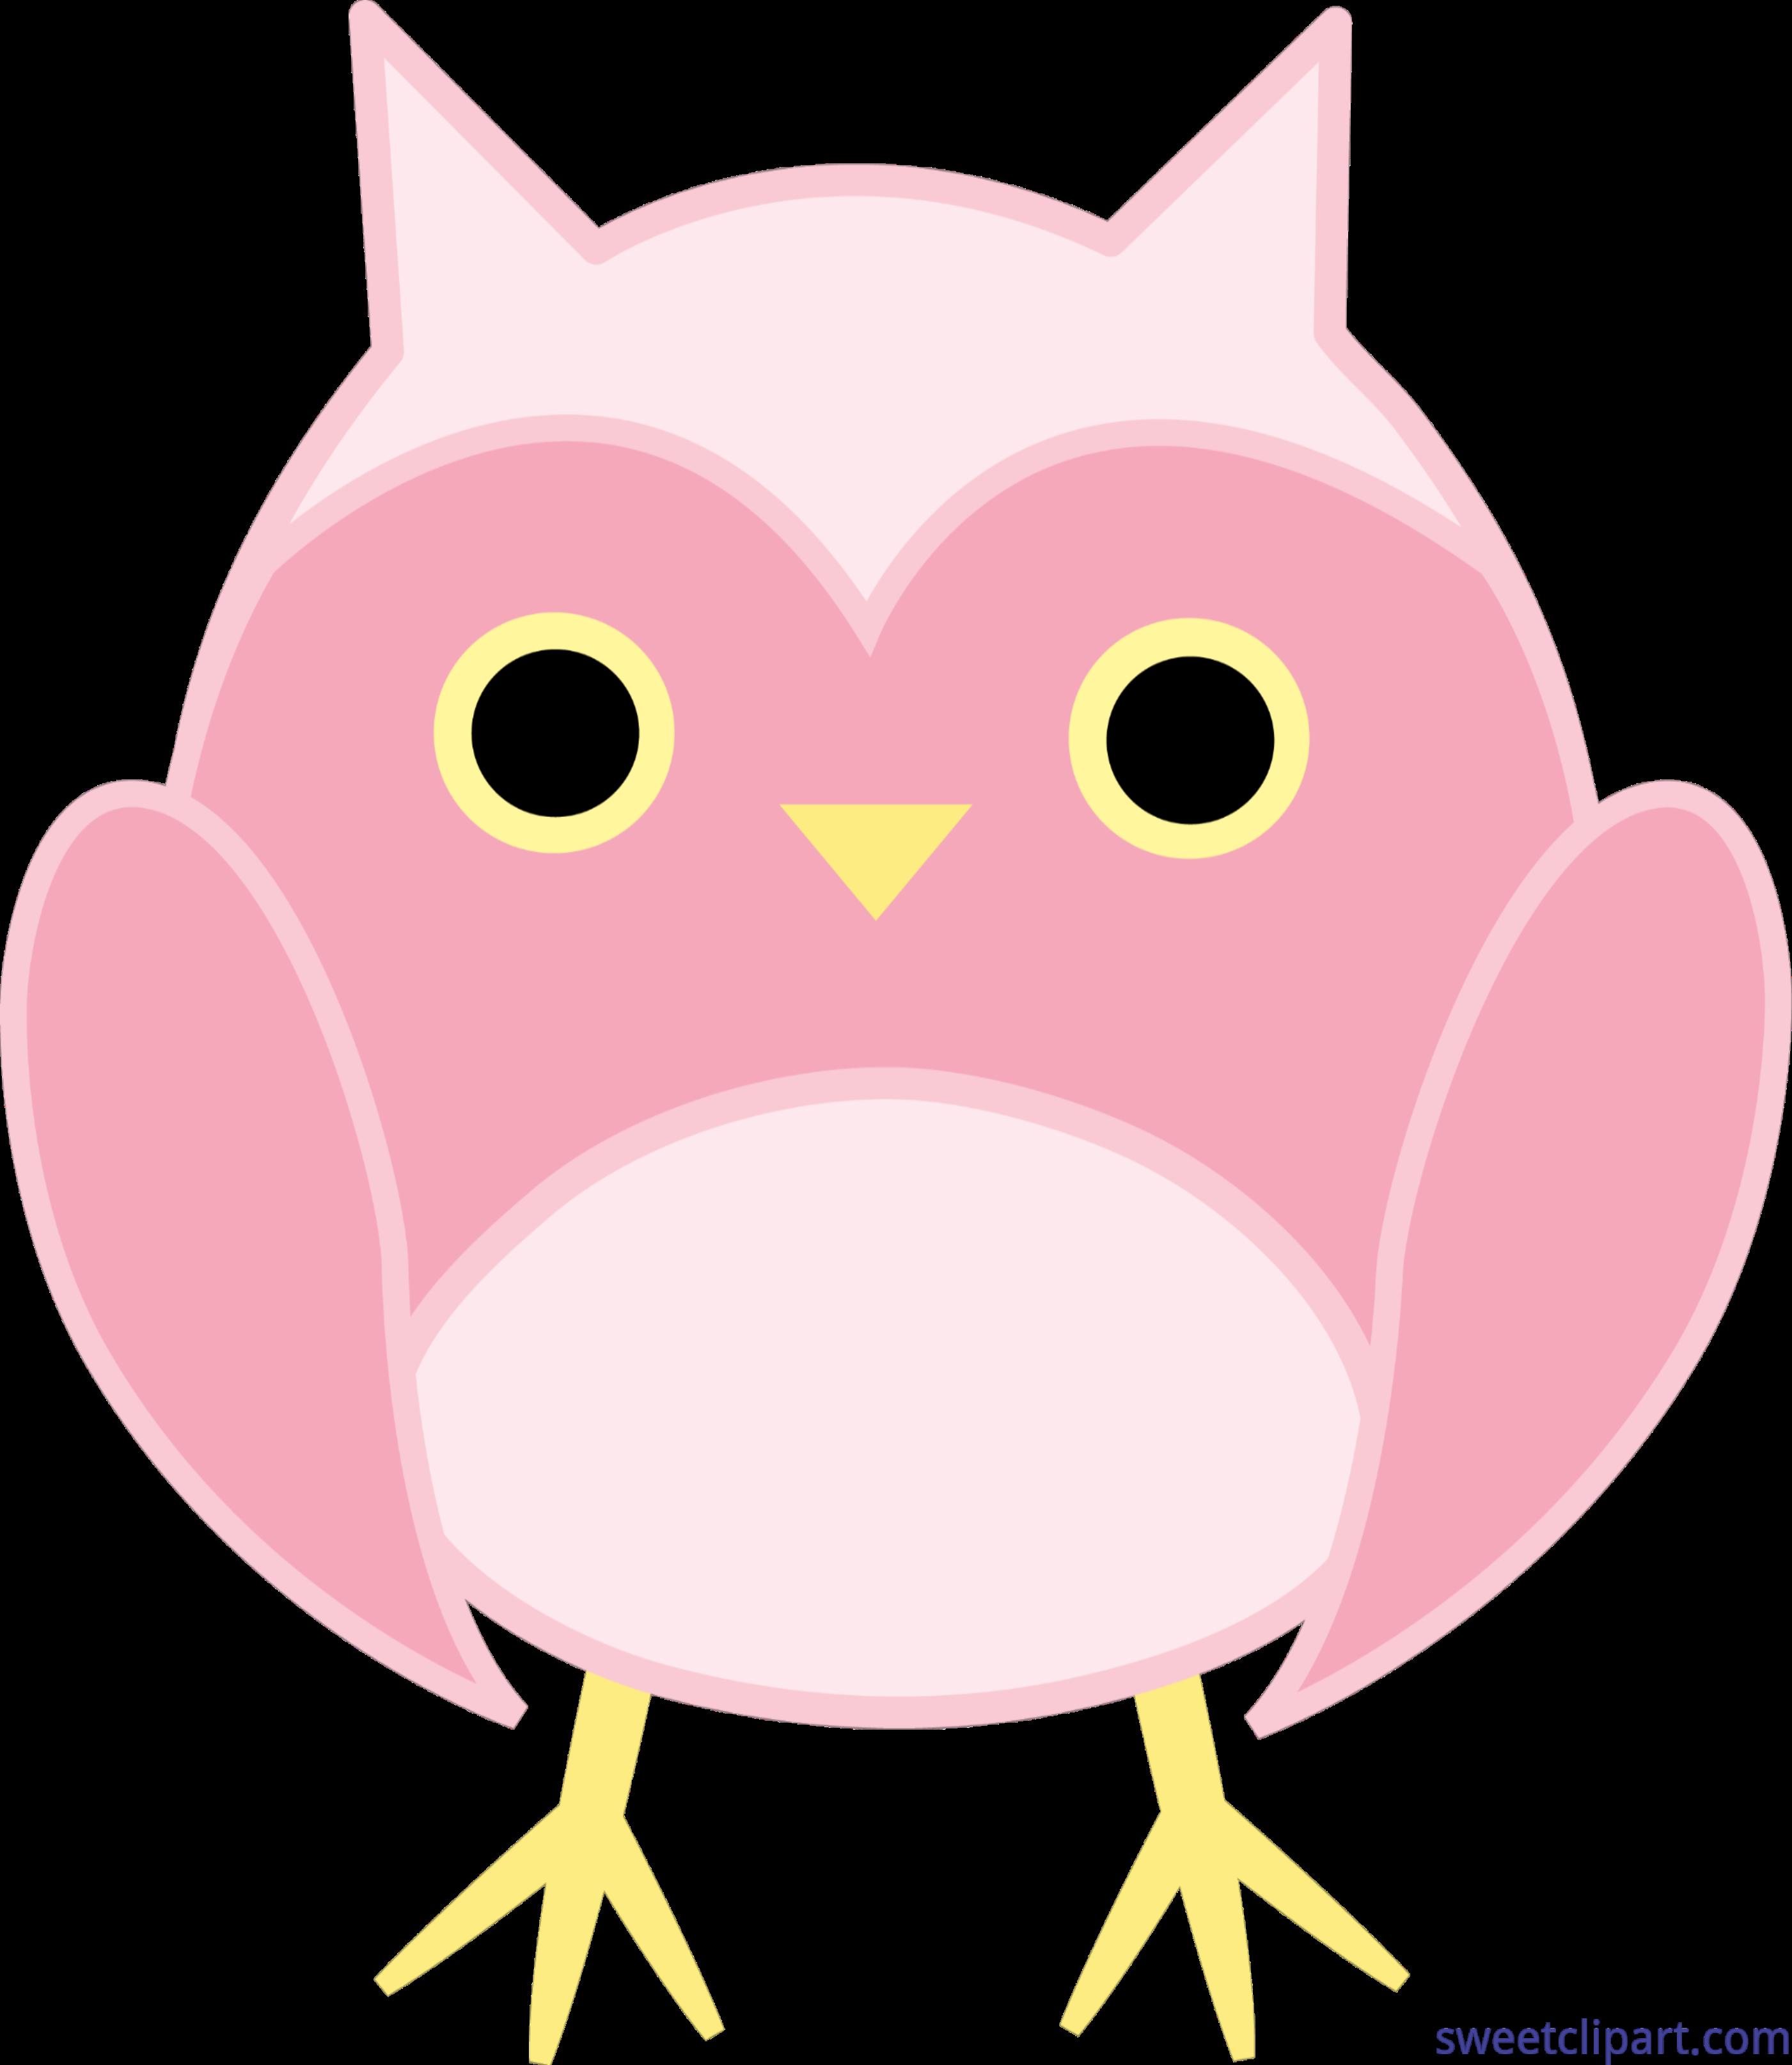 Email clipart design cute. Owl pink clip art